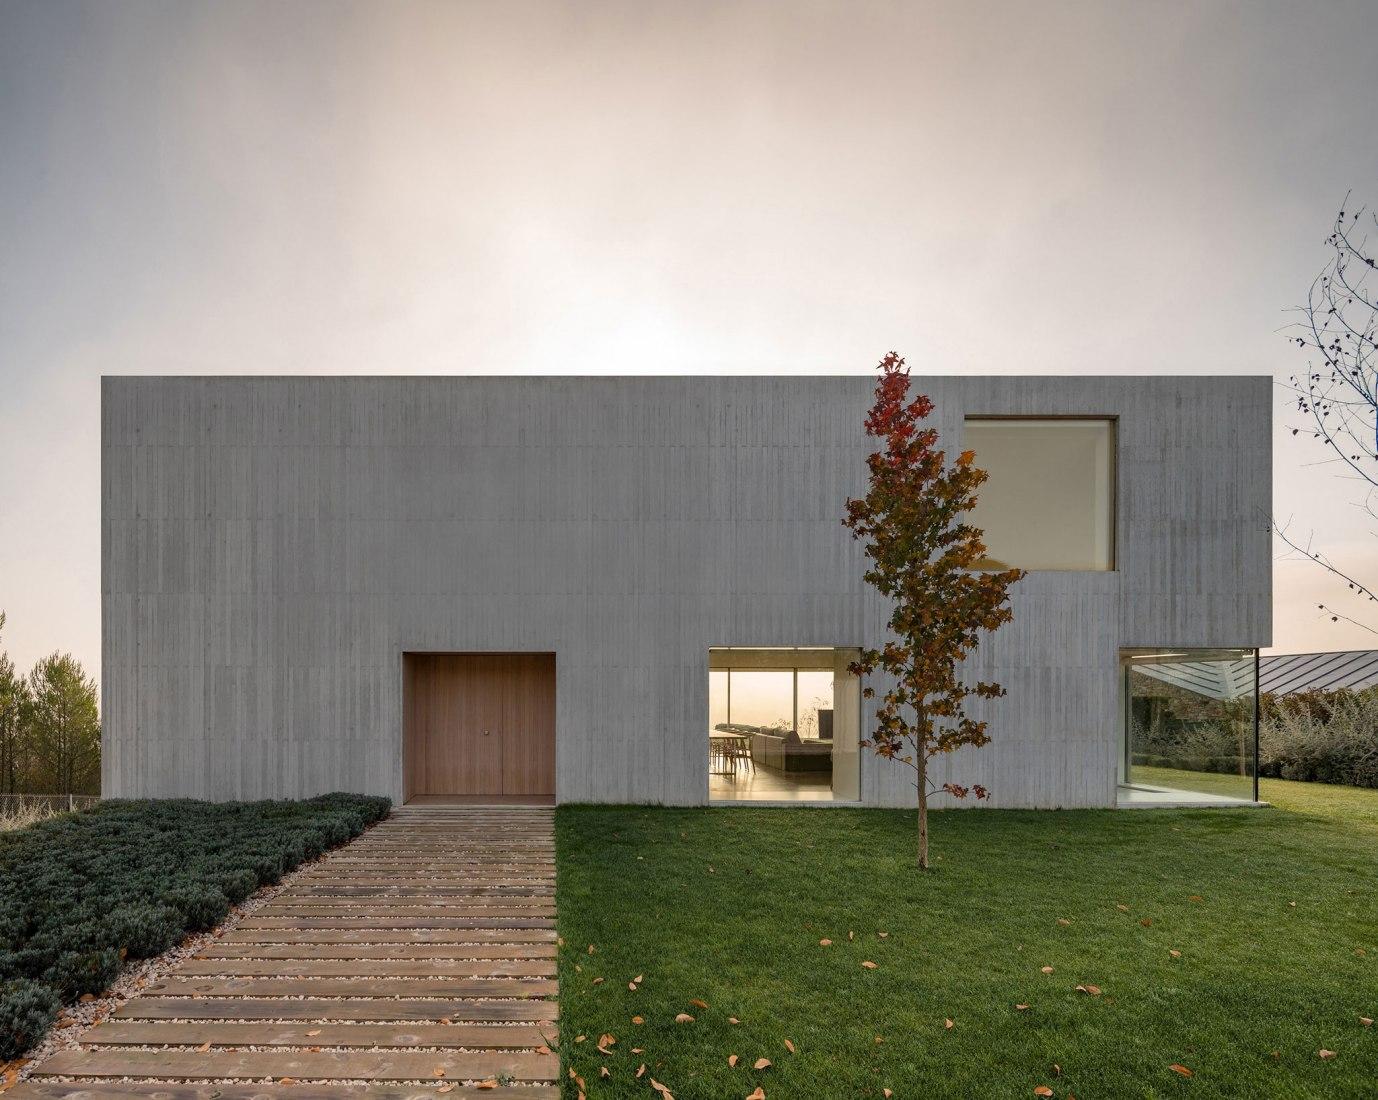 Vivienda en Pamplona, por Pereda Pérez Arquitectos. Fotografía por Pedro Pegenaute